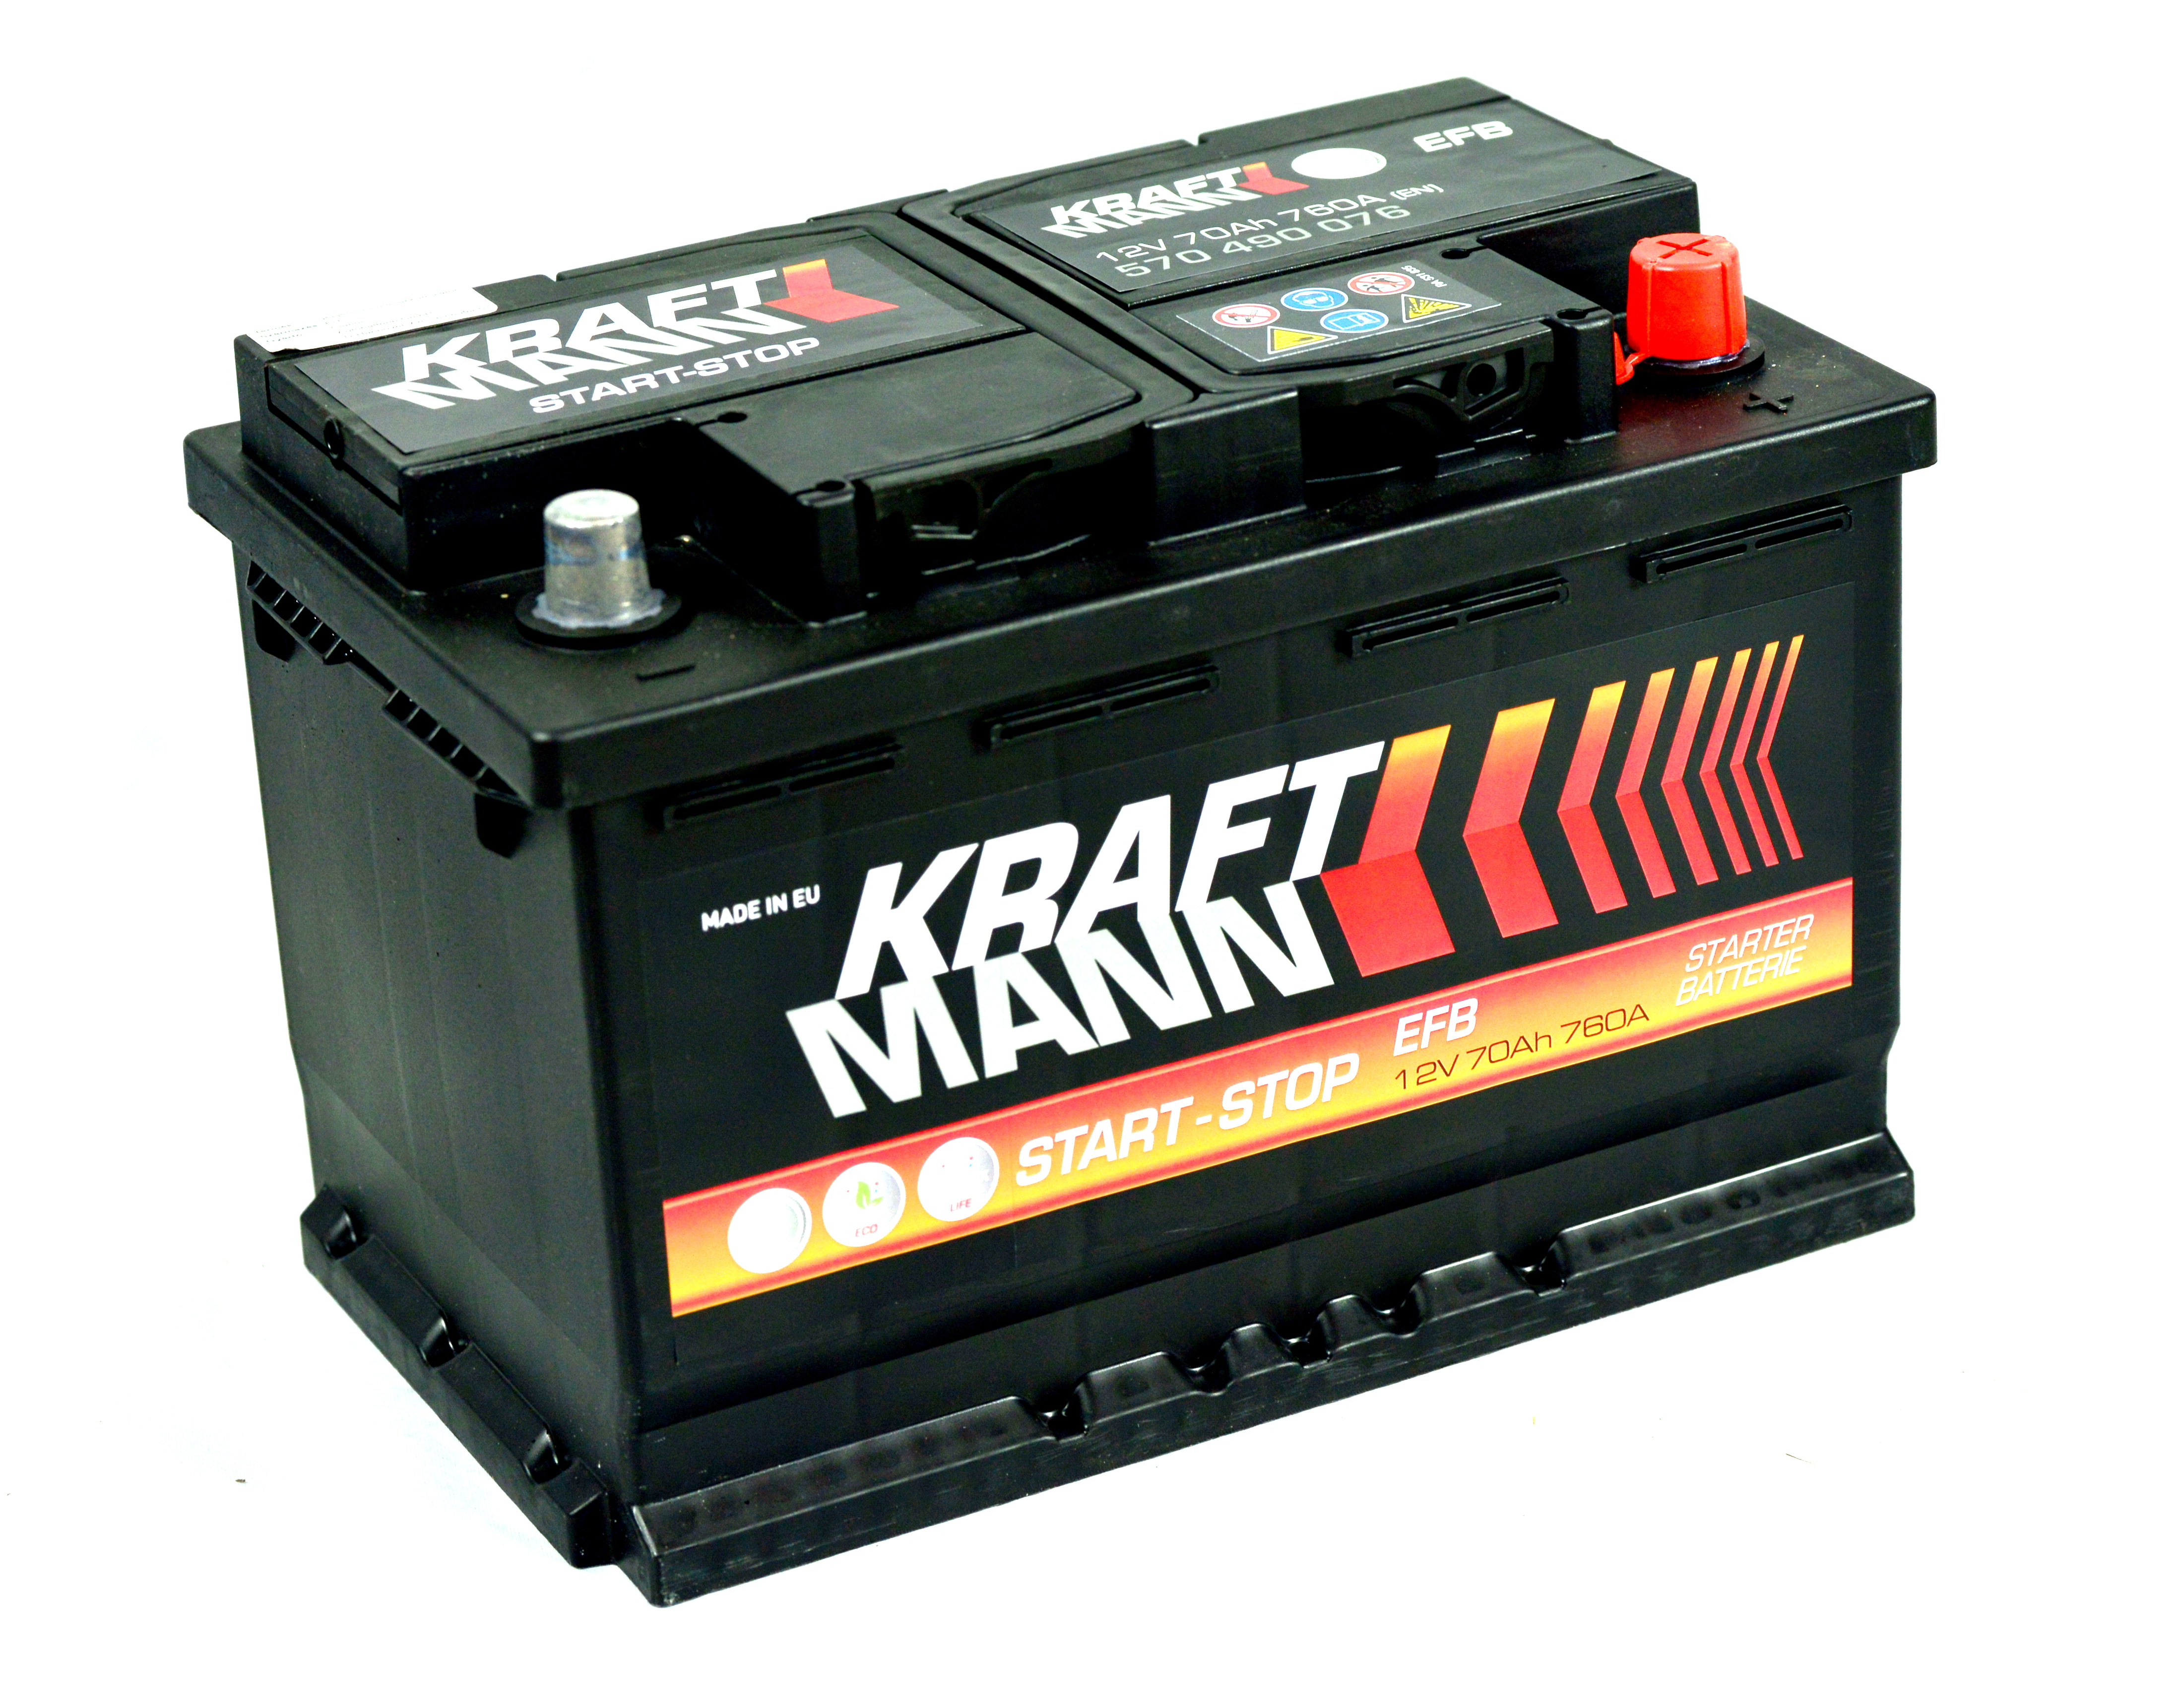 Kraftmann-EFB--12v-70ah-jobb--start-stop--auto-akkumulator-